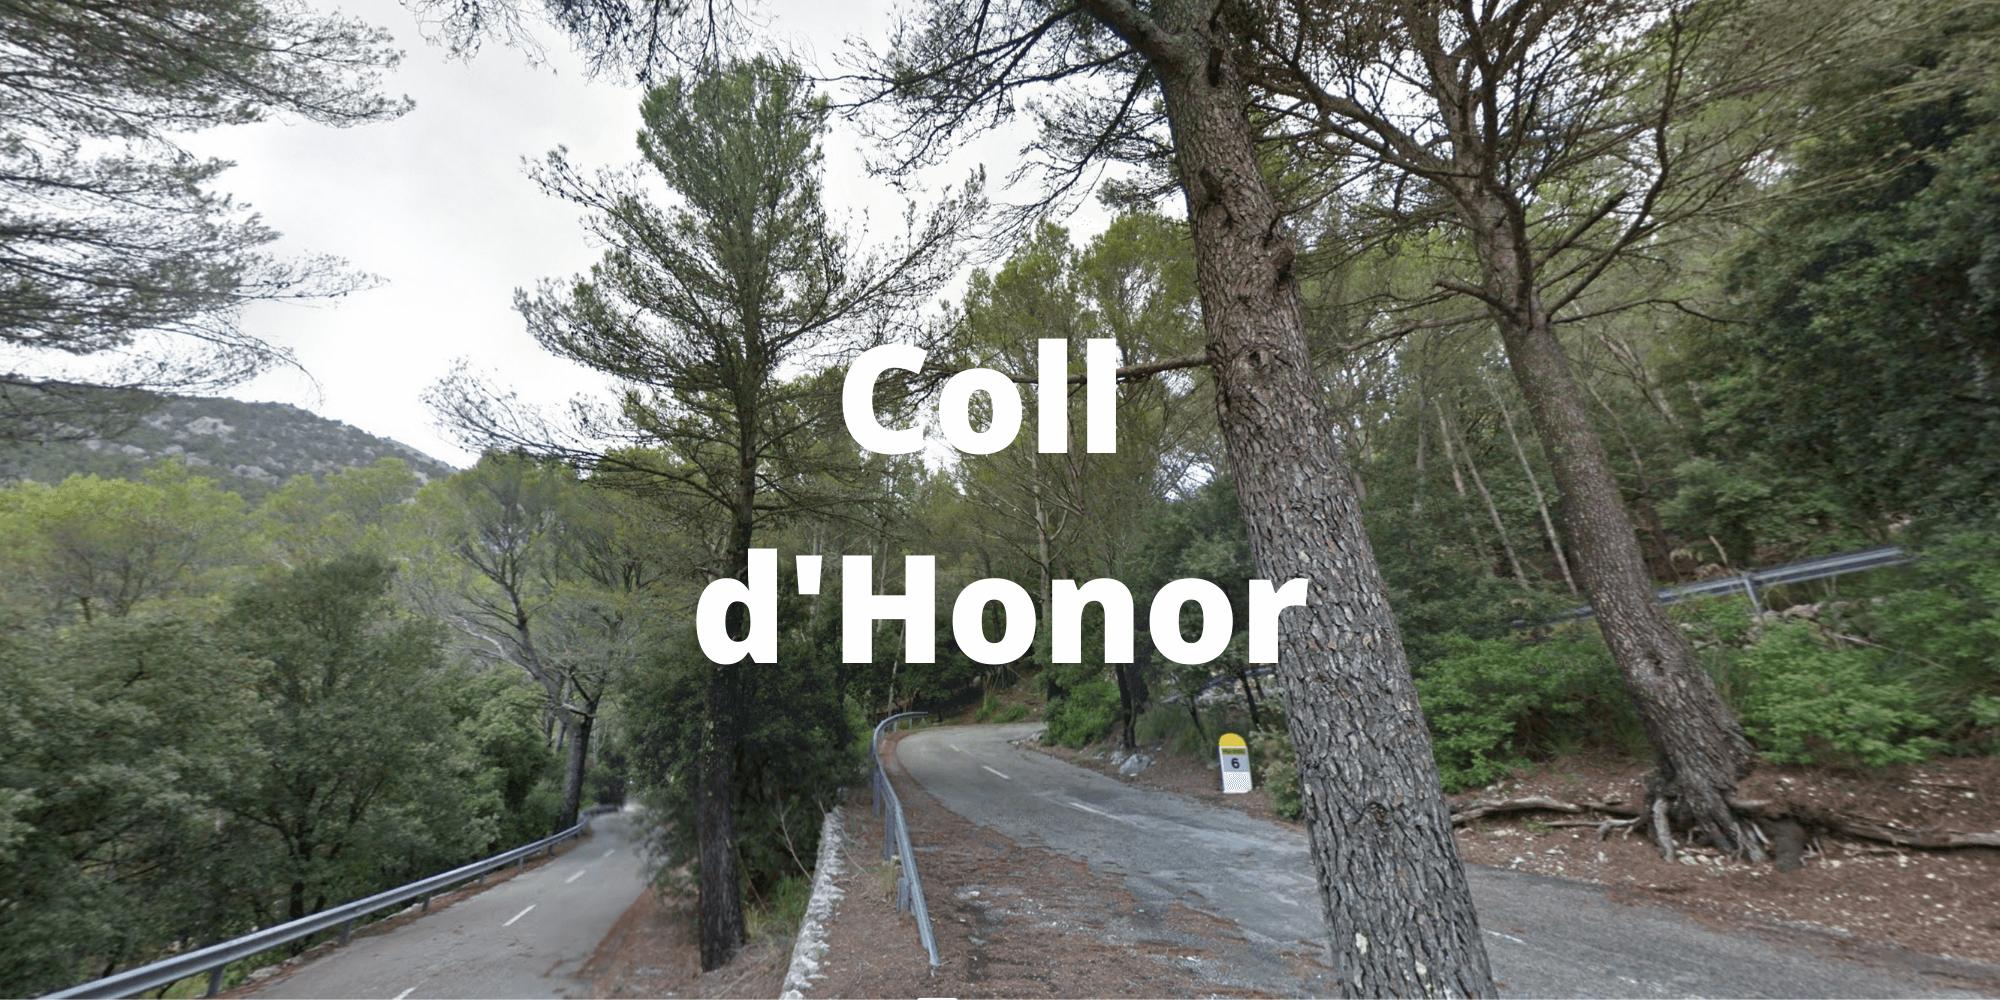 The Coll d'Honor in Mallorca